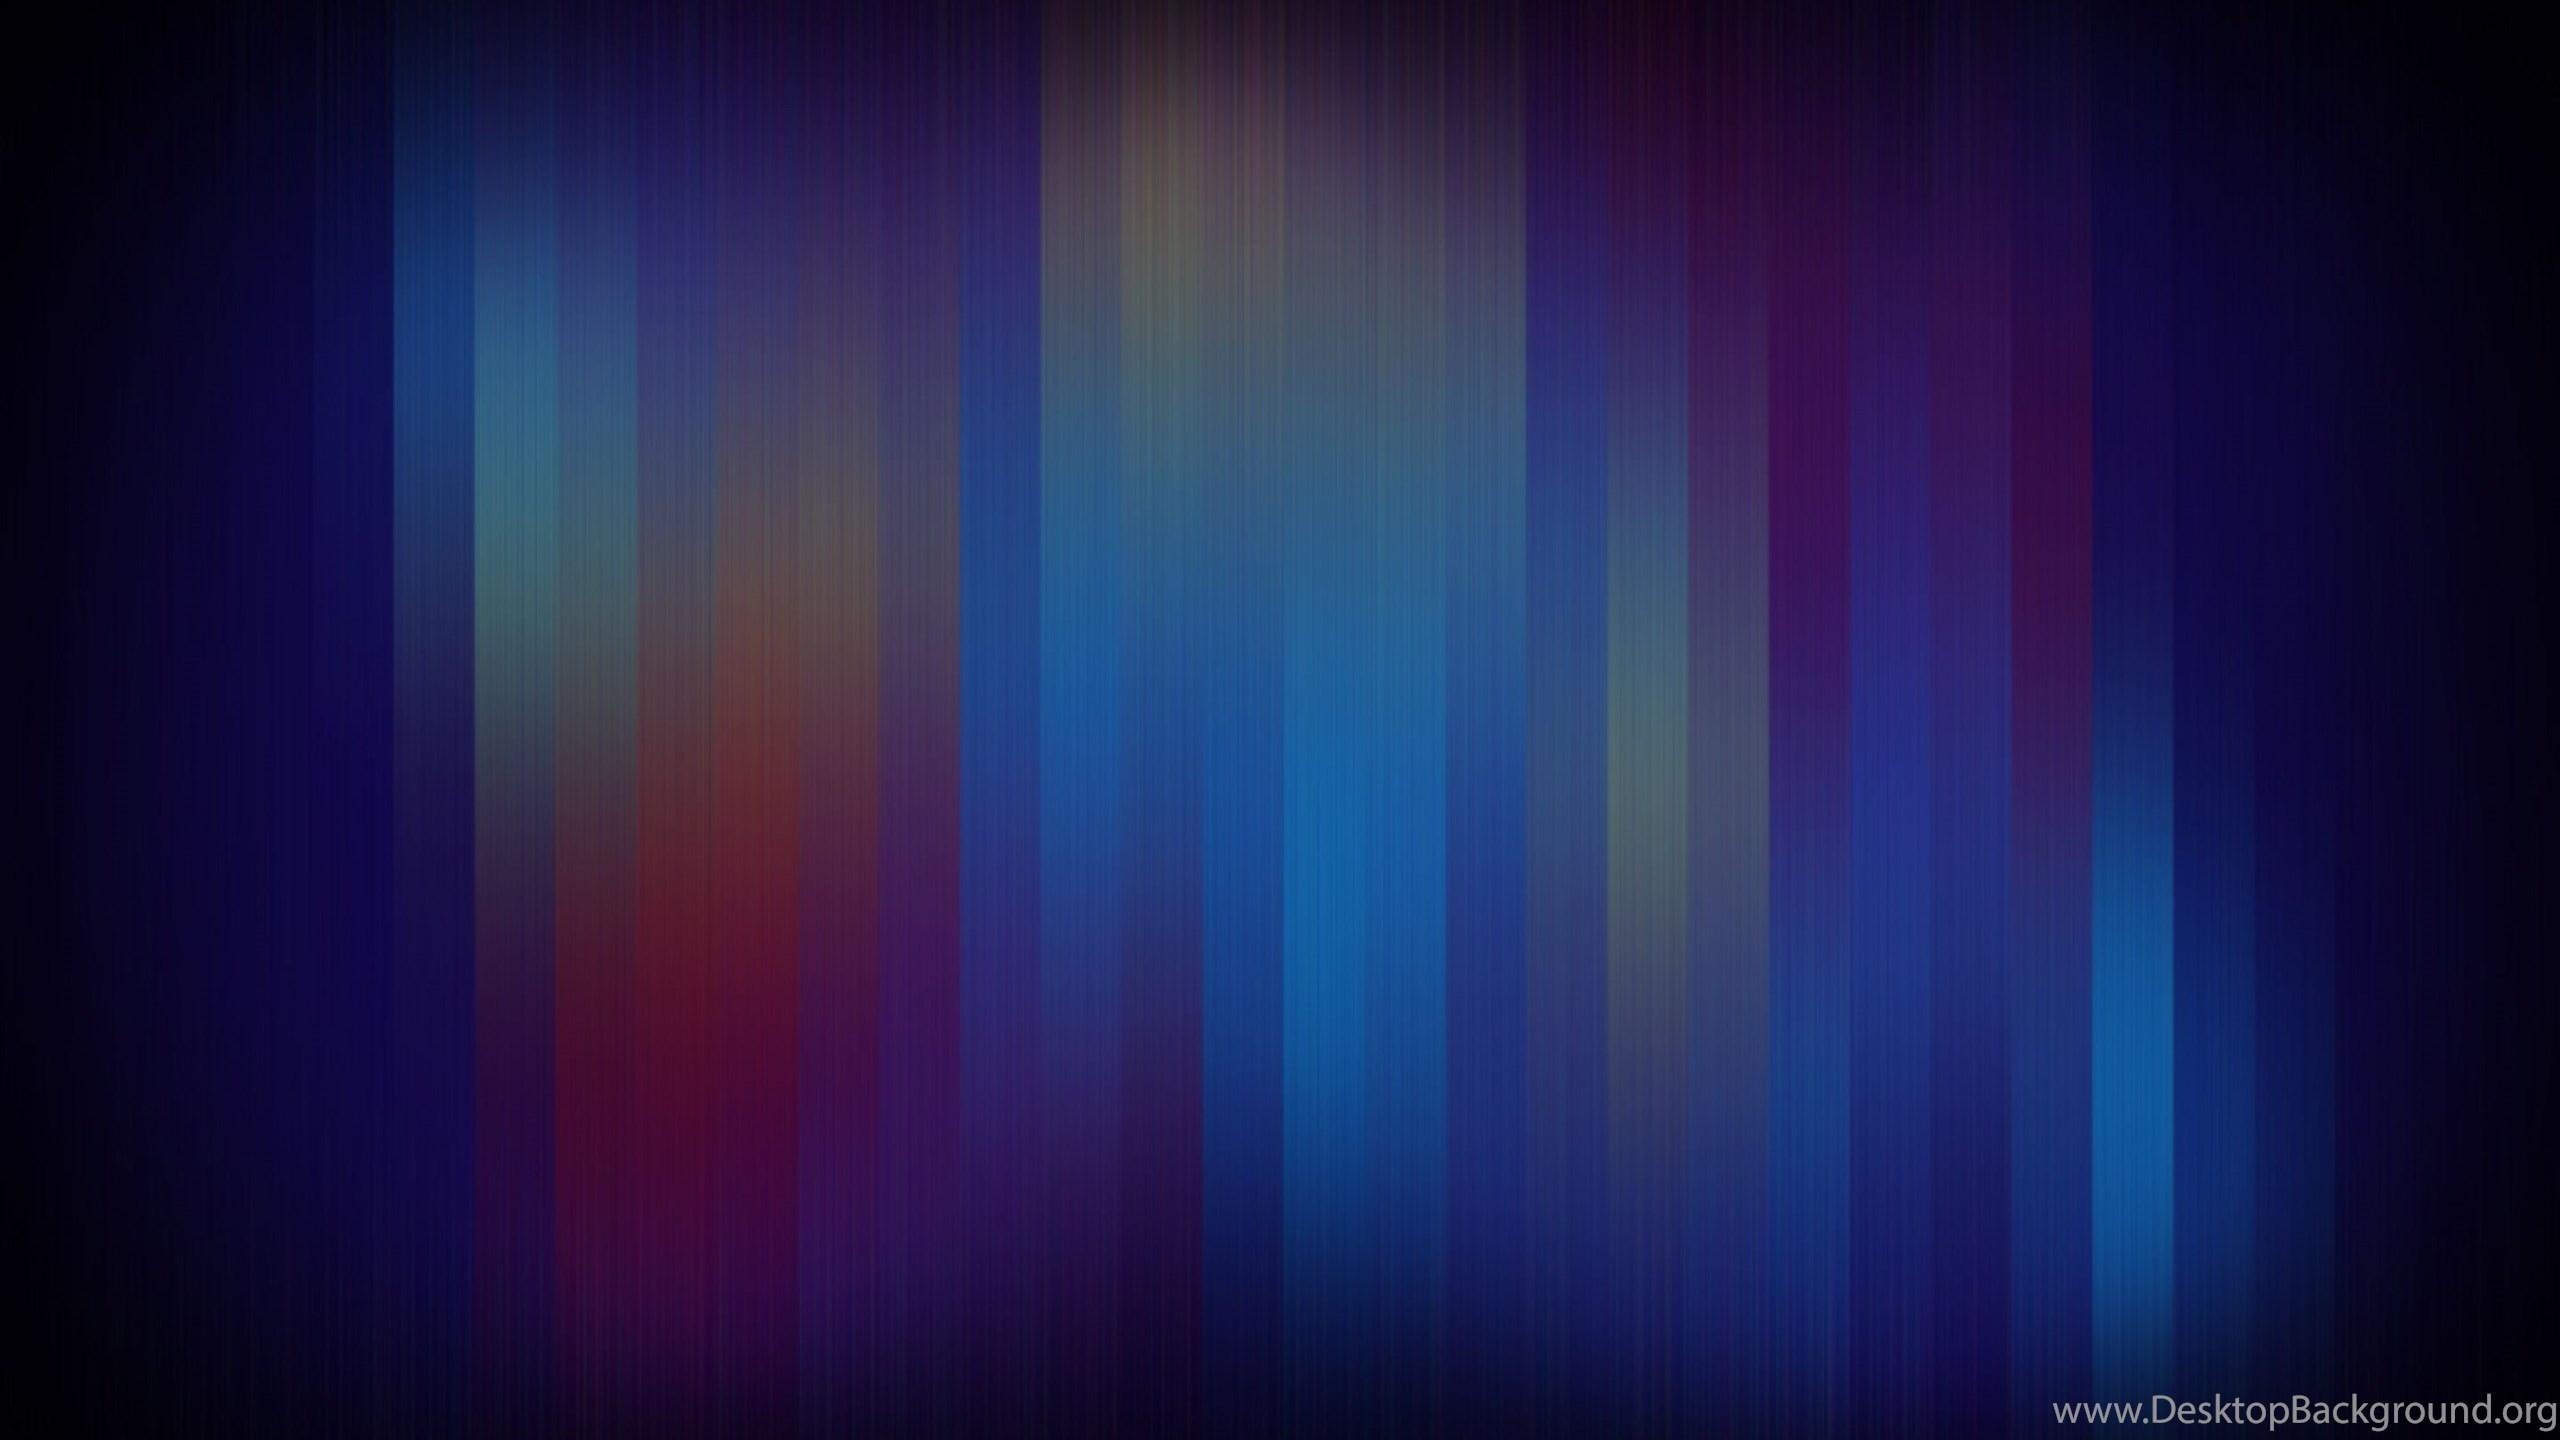 Best Wallpaper Macbook Blue - 473815_teq-colourful-lines-abstract-wallpaper-macbook-pro-retina-display_2880x1800_h  Pic_216772.jpg